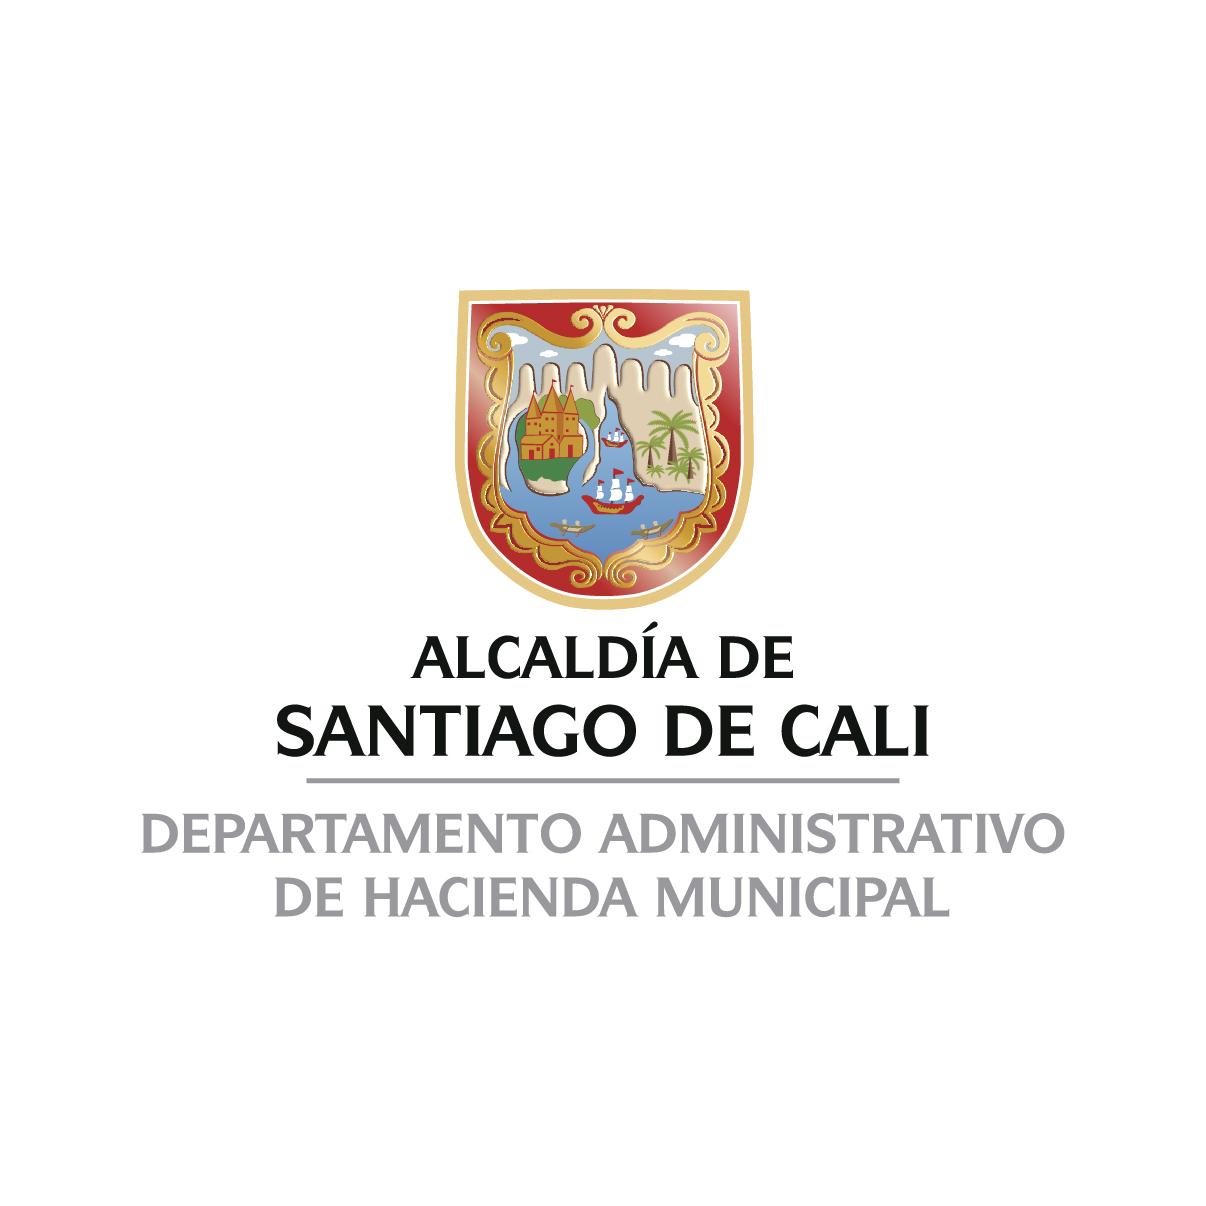 departamento-administrativo-de-hacienda-municipal